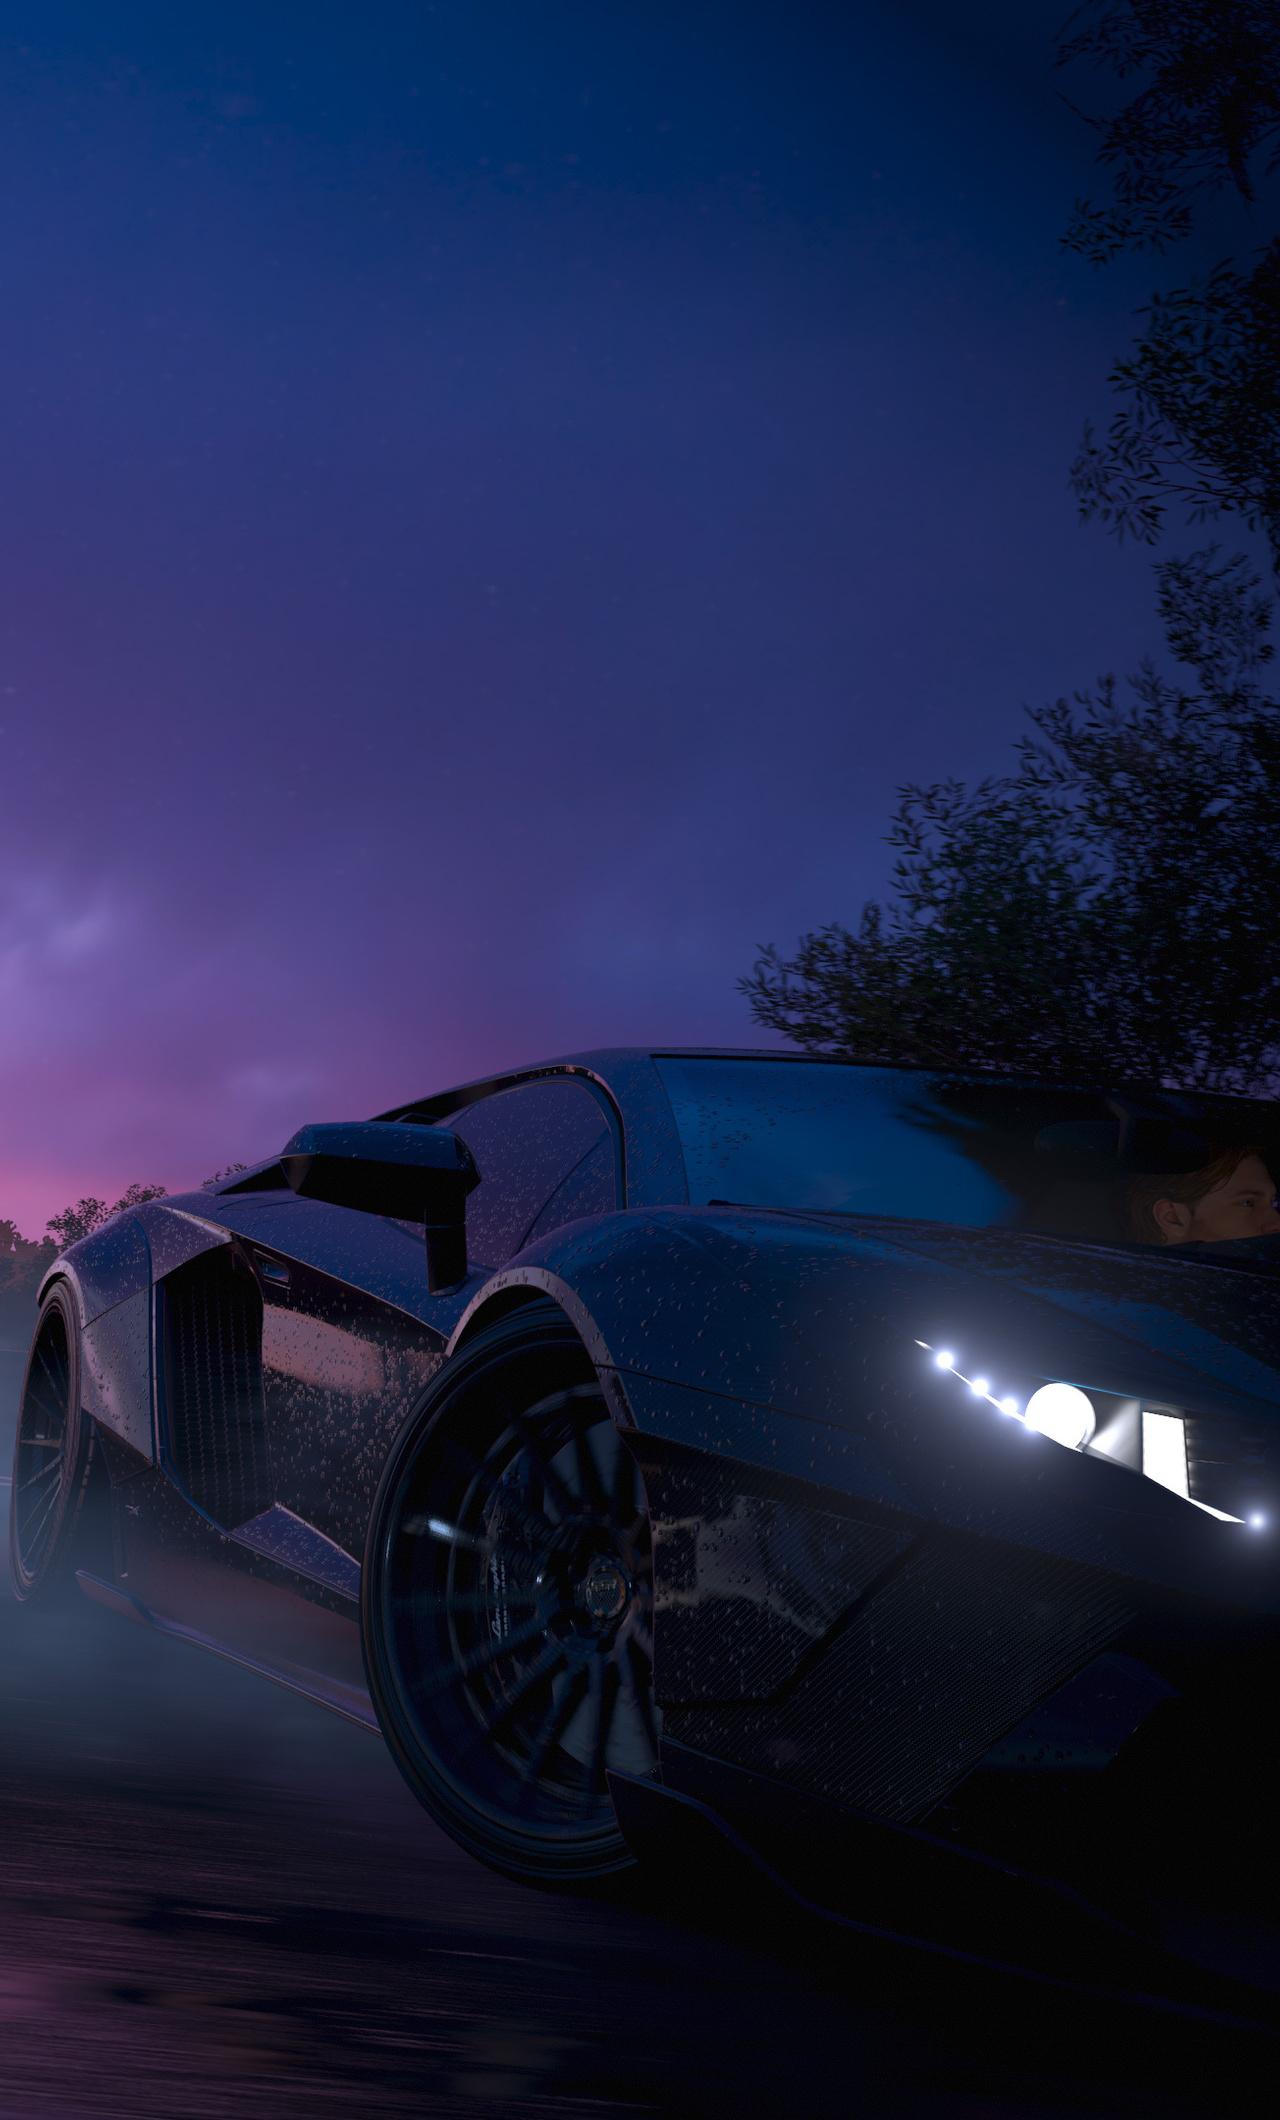 Forza Horizon 3 4k Lamborghini Aventador E7